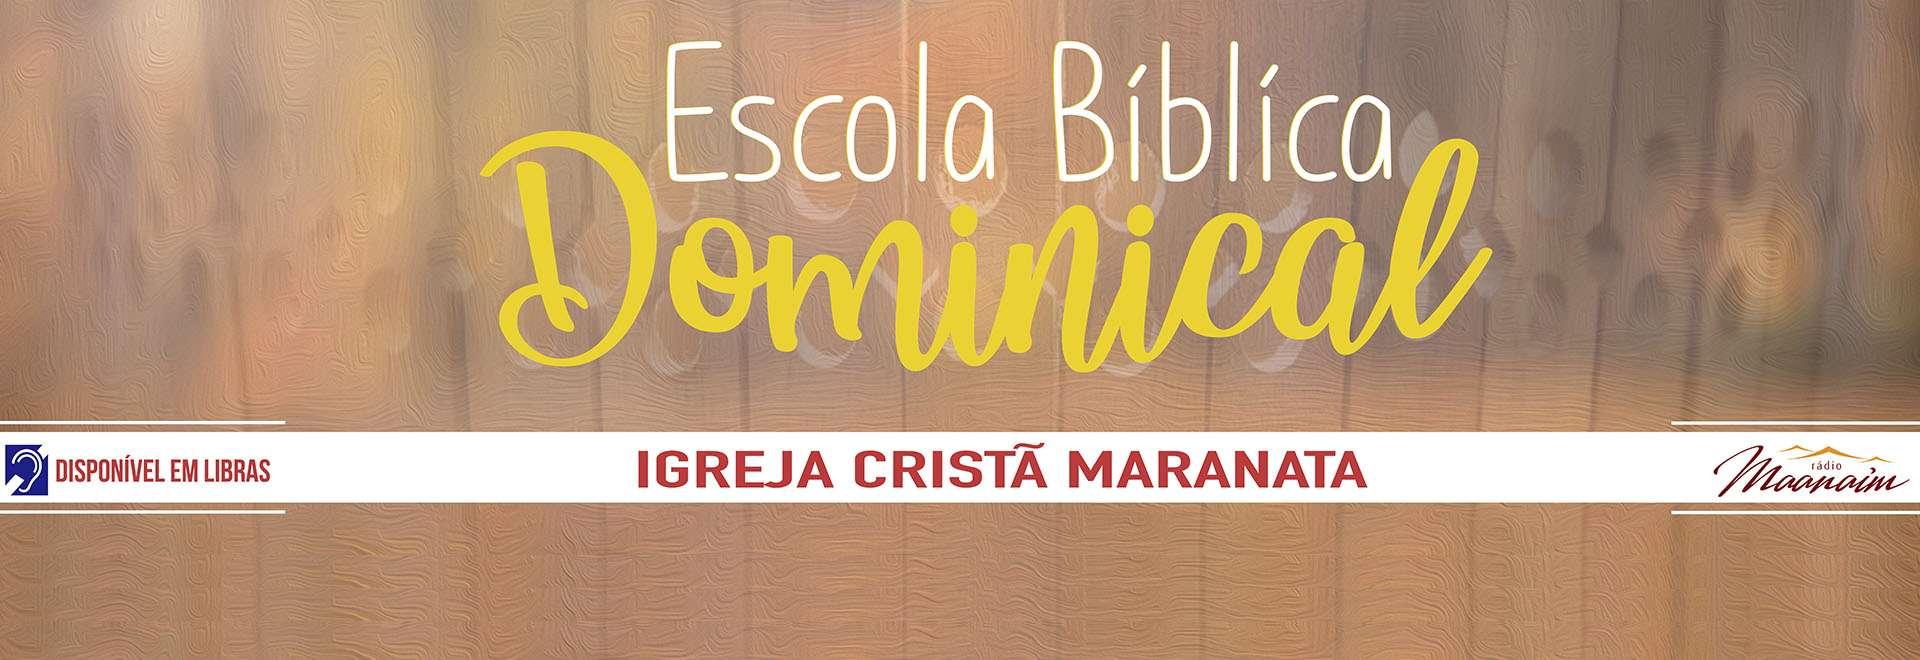 Participações da EBD da Igreja Cristã Maranata - 25/10/2020